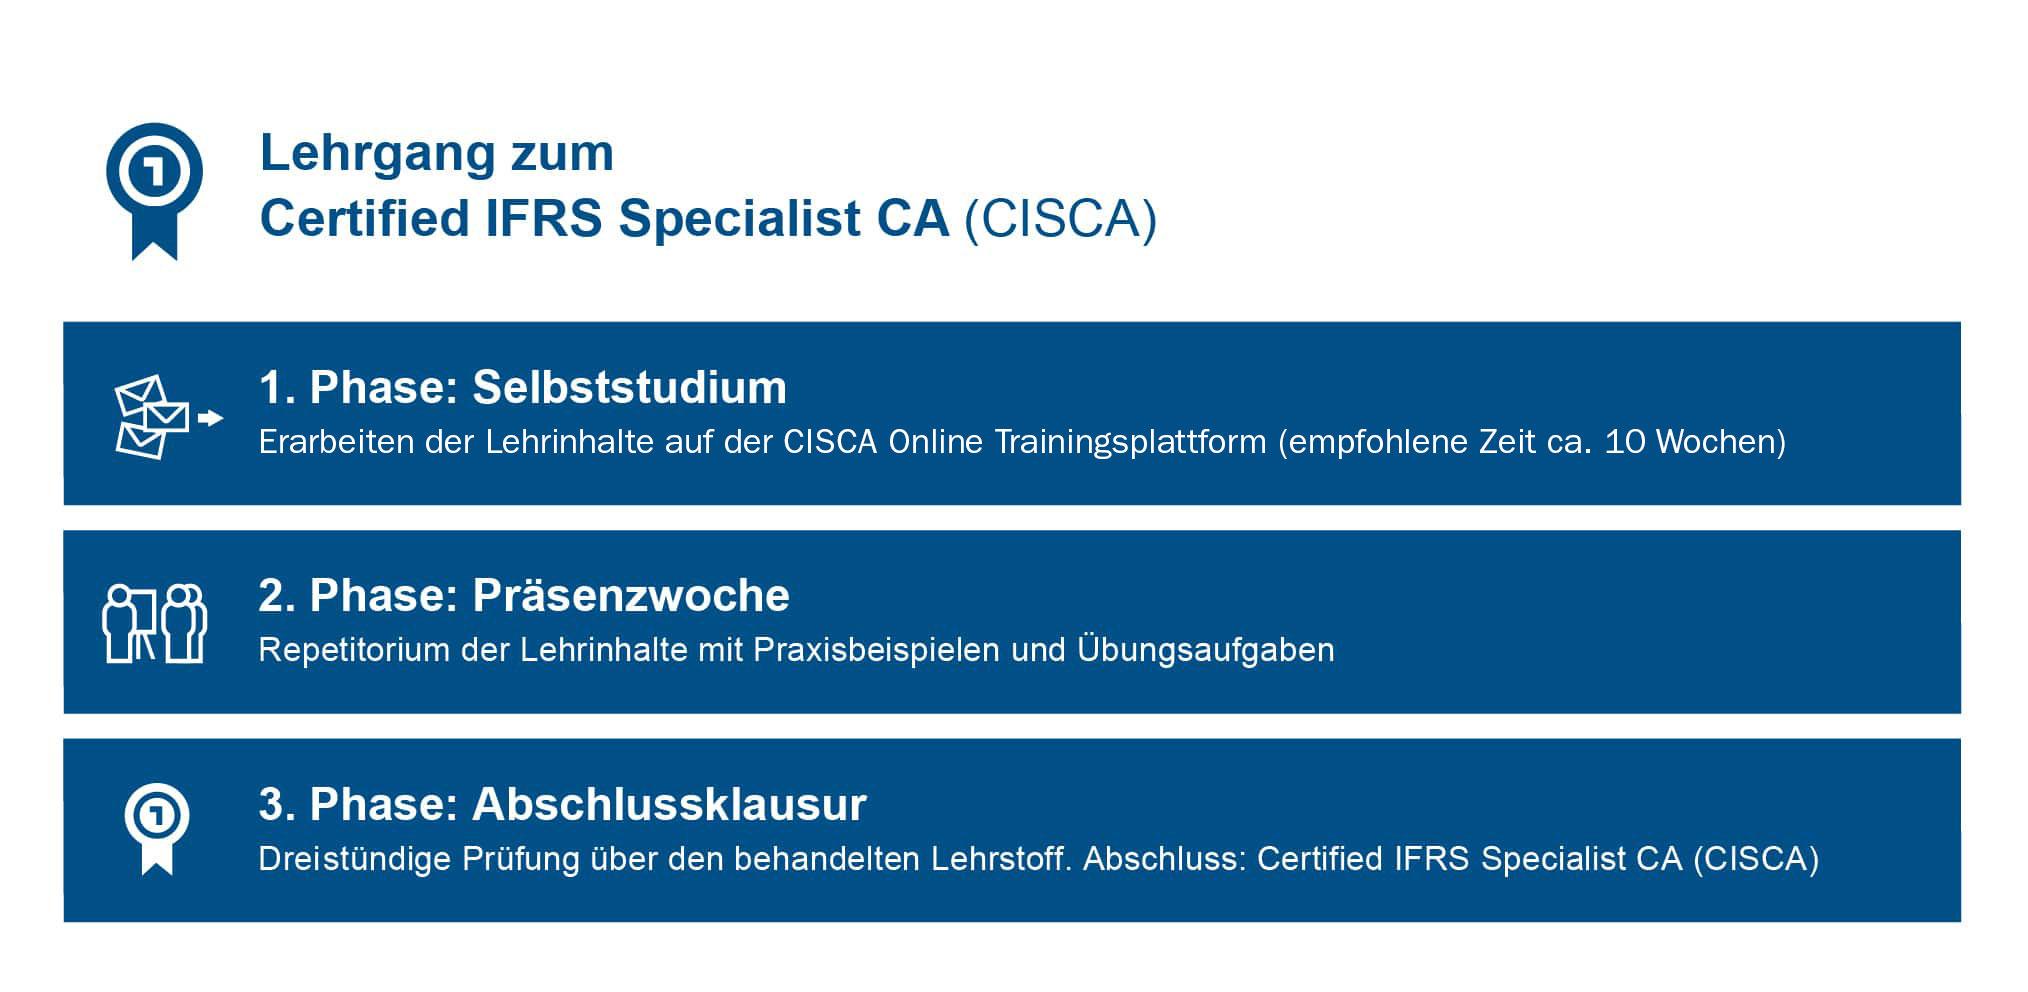 Certified IFRS Specialist CISCA